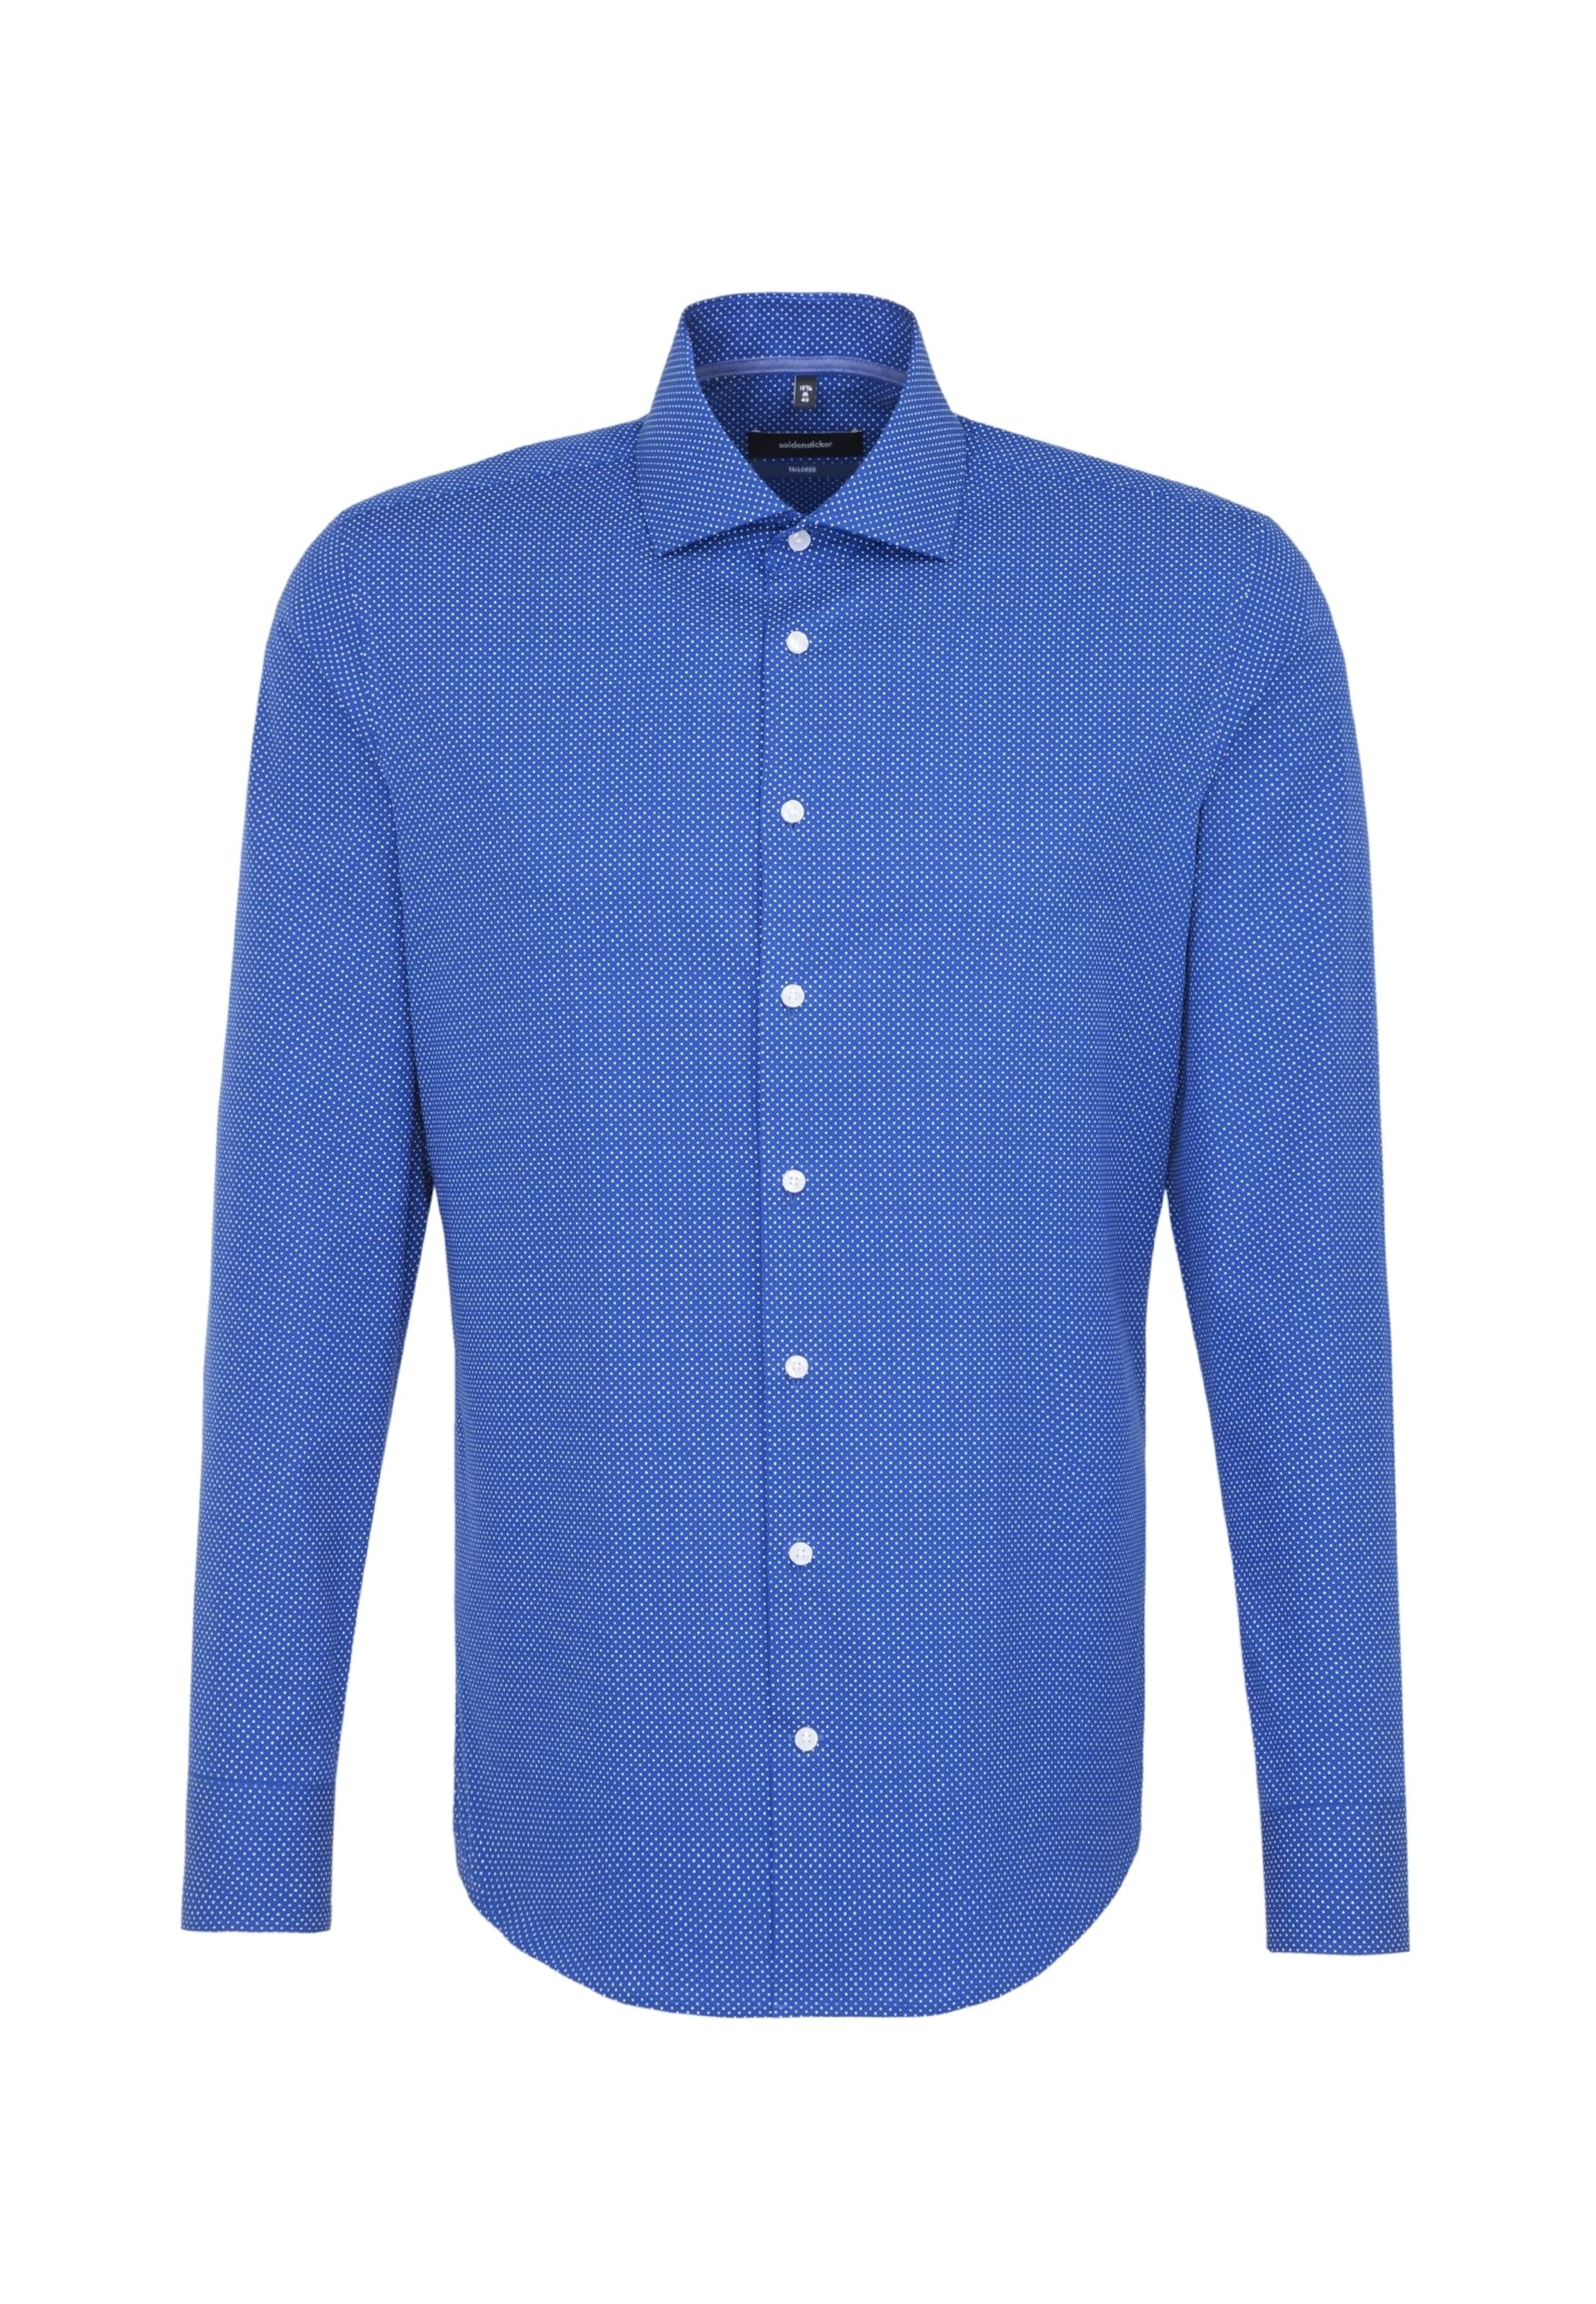 Hemd Seidensticker In 'tailored' 'tailored' Seidensticker 'tailored' In Seidensticker Hemd BlauWeiß BlauWeiß Hemd xWerCBQdo